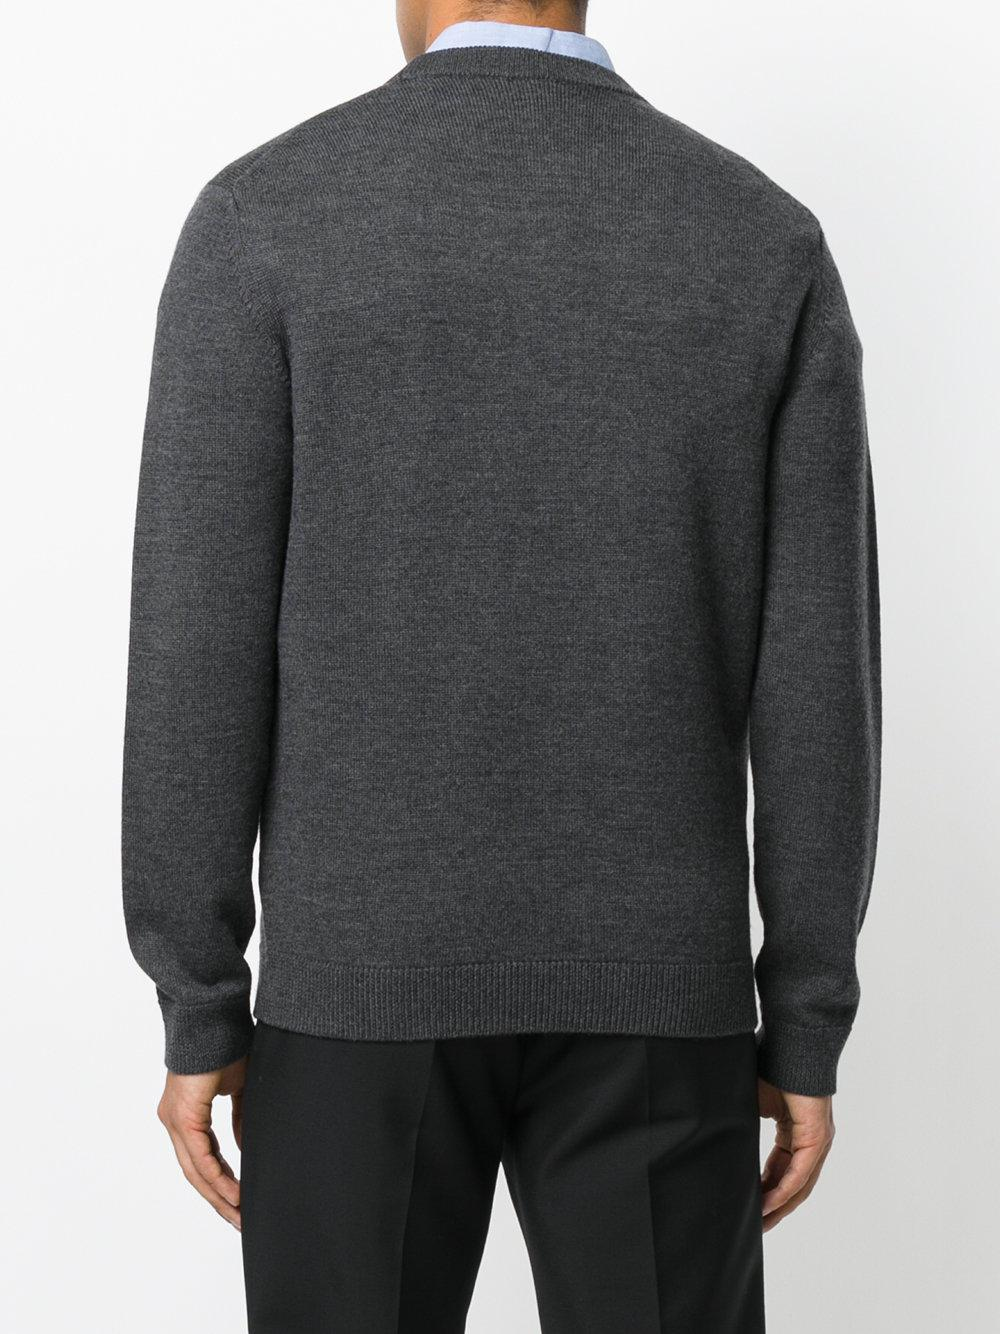 KENZO Wool Crewneck Tee in Grey (Grey) for Men